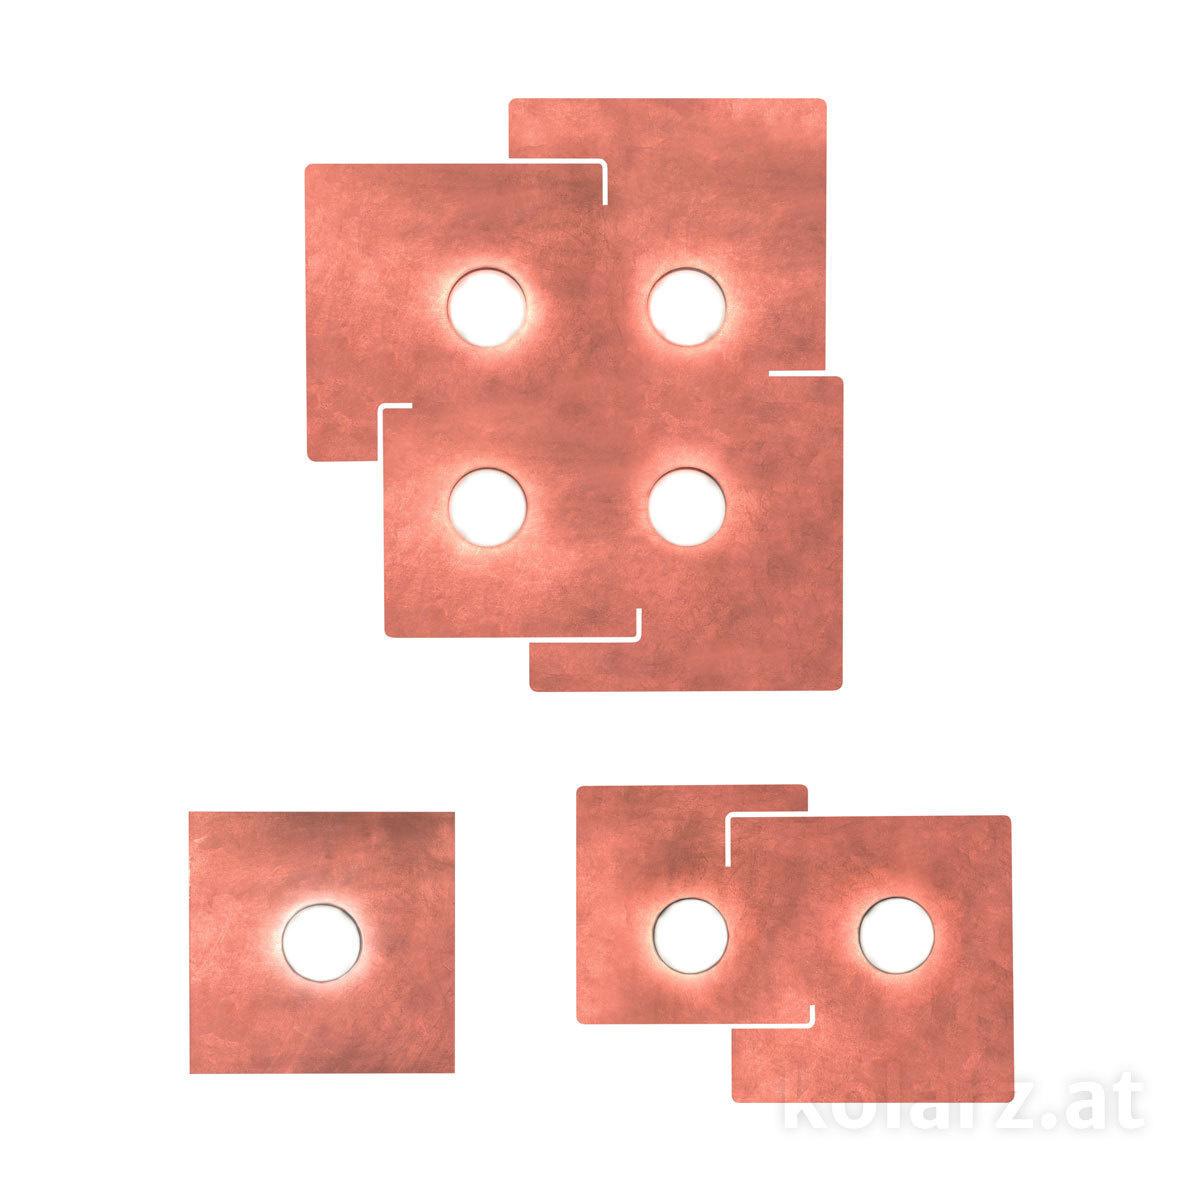 A1337-11-1-Cu-f2.jpg